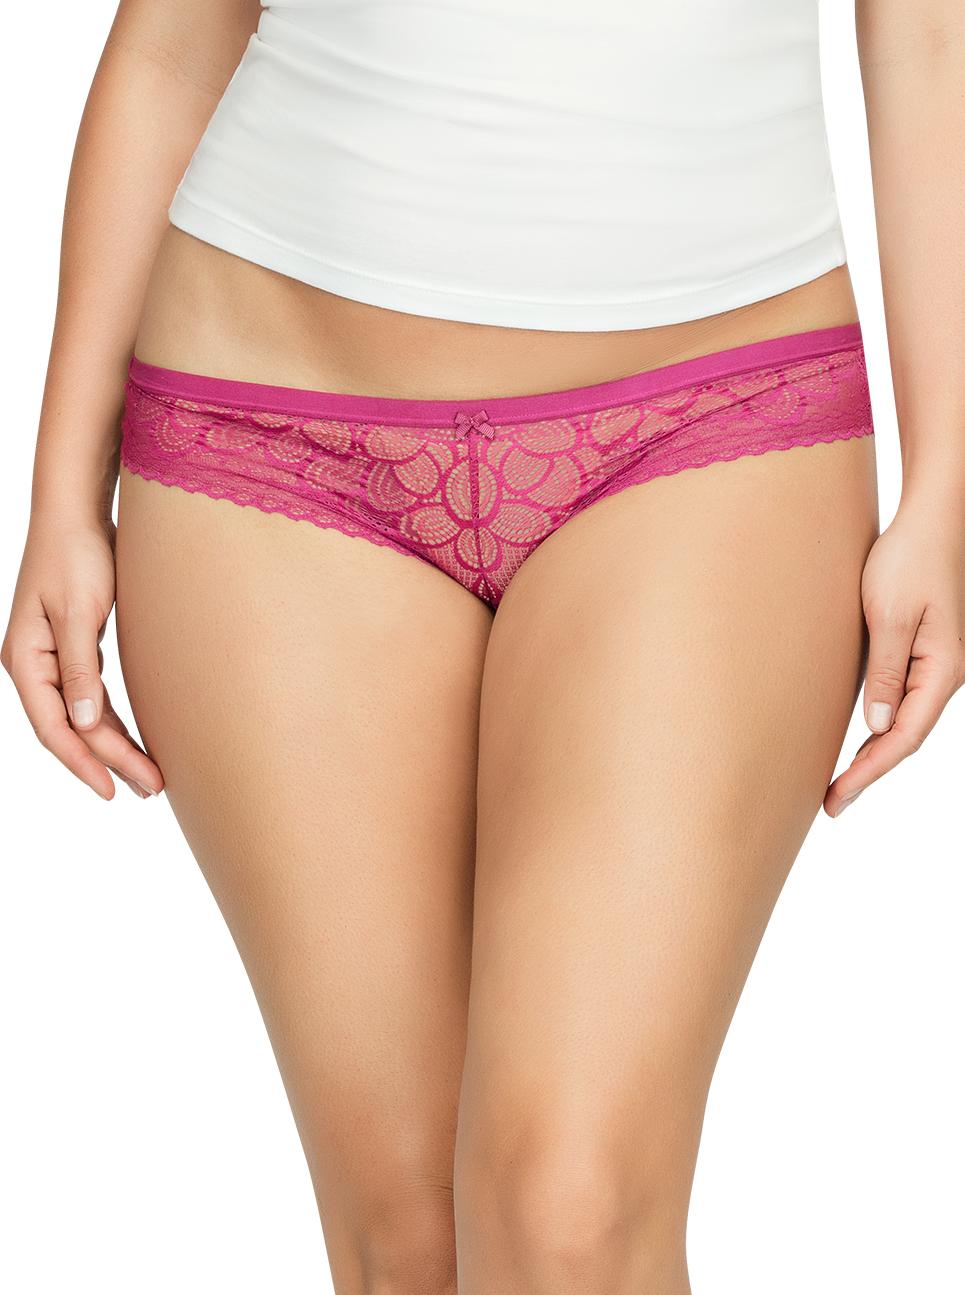 PARFAIT ParfaitPanty SoGlam BikiniPP302 Raspberry Front1 - Panty So Glam Bikini - Raspberry - PP302